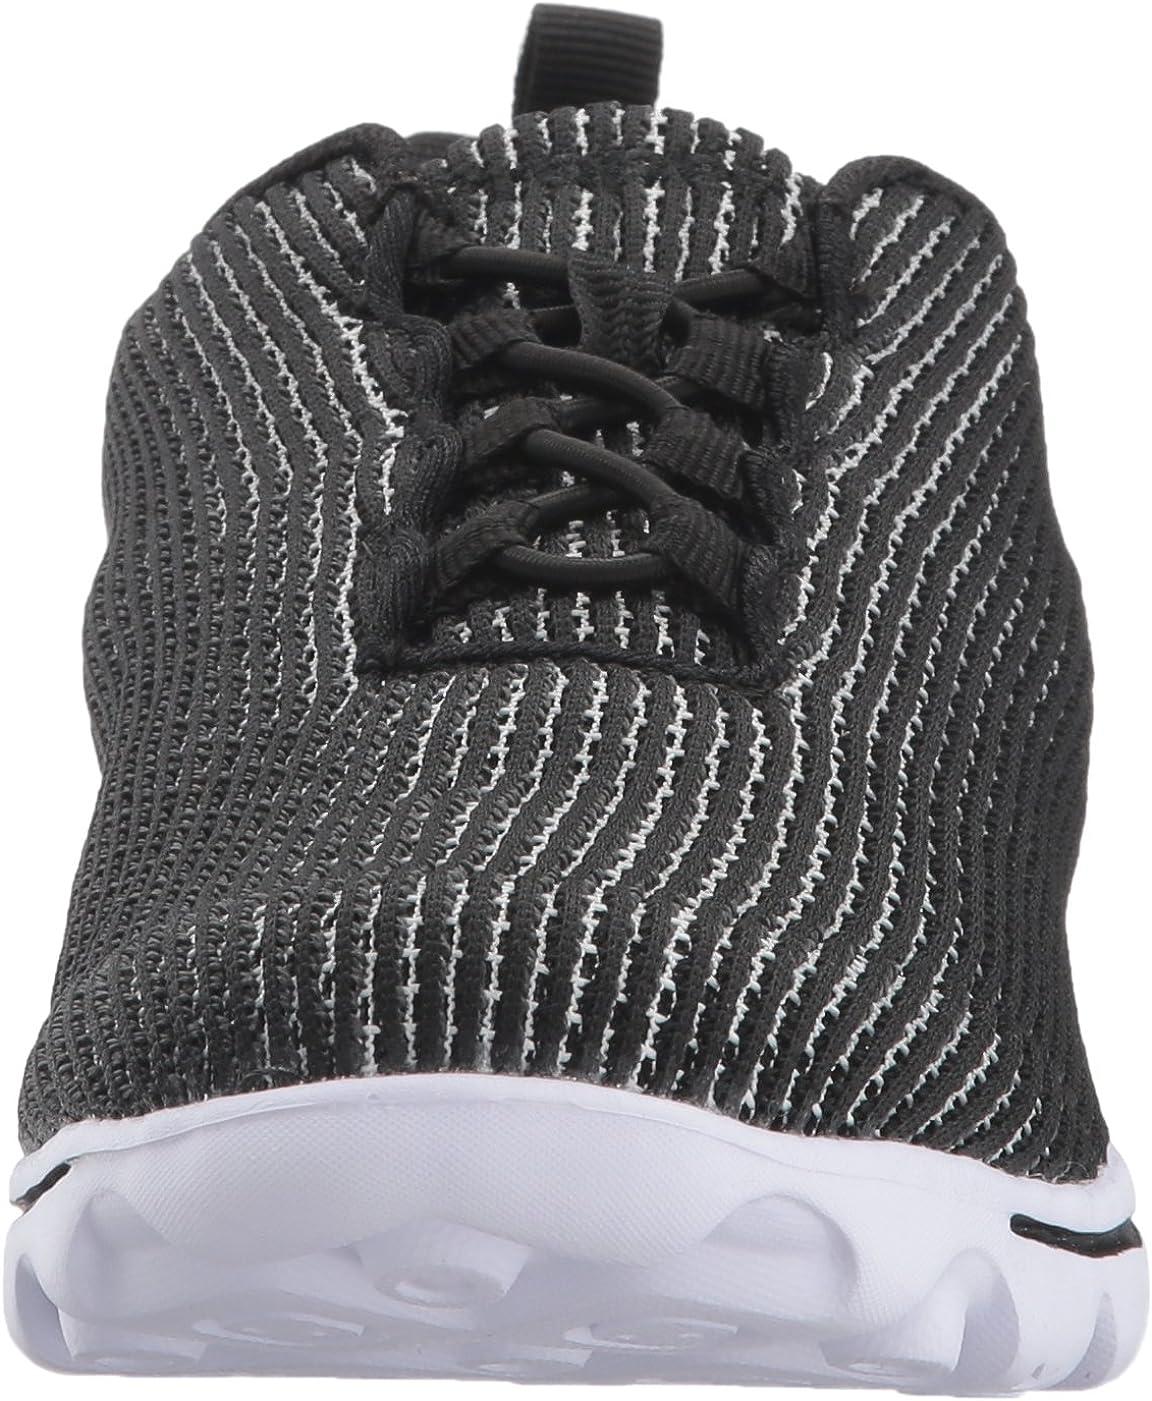 Propét Women's TravelActiv Xpress Sneaker Black/White